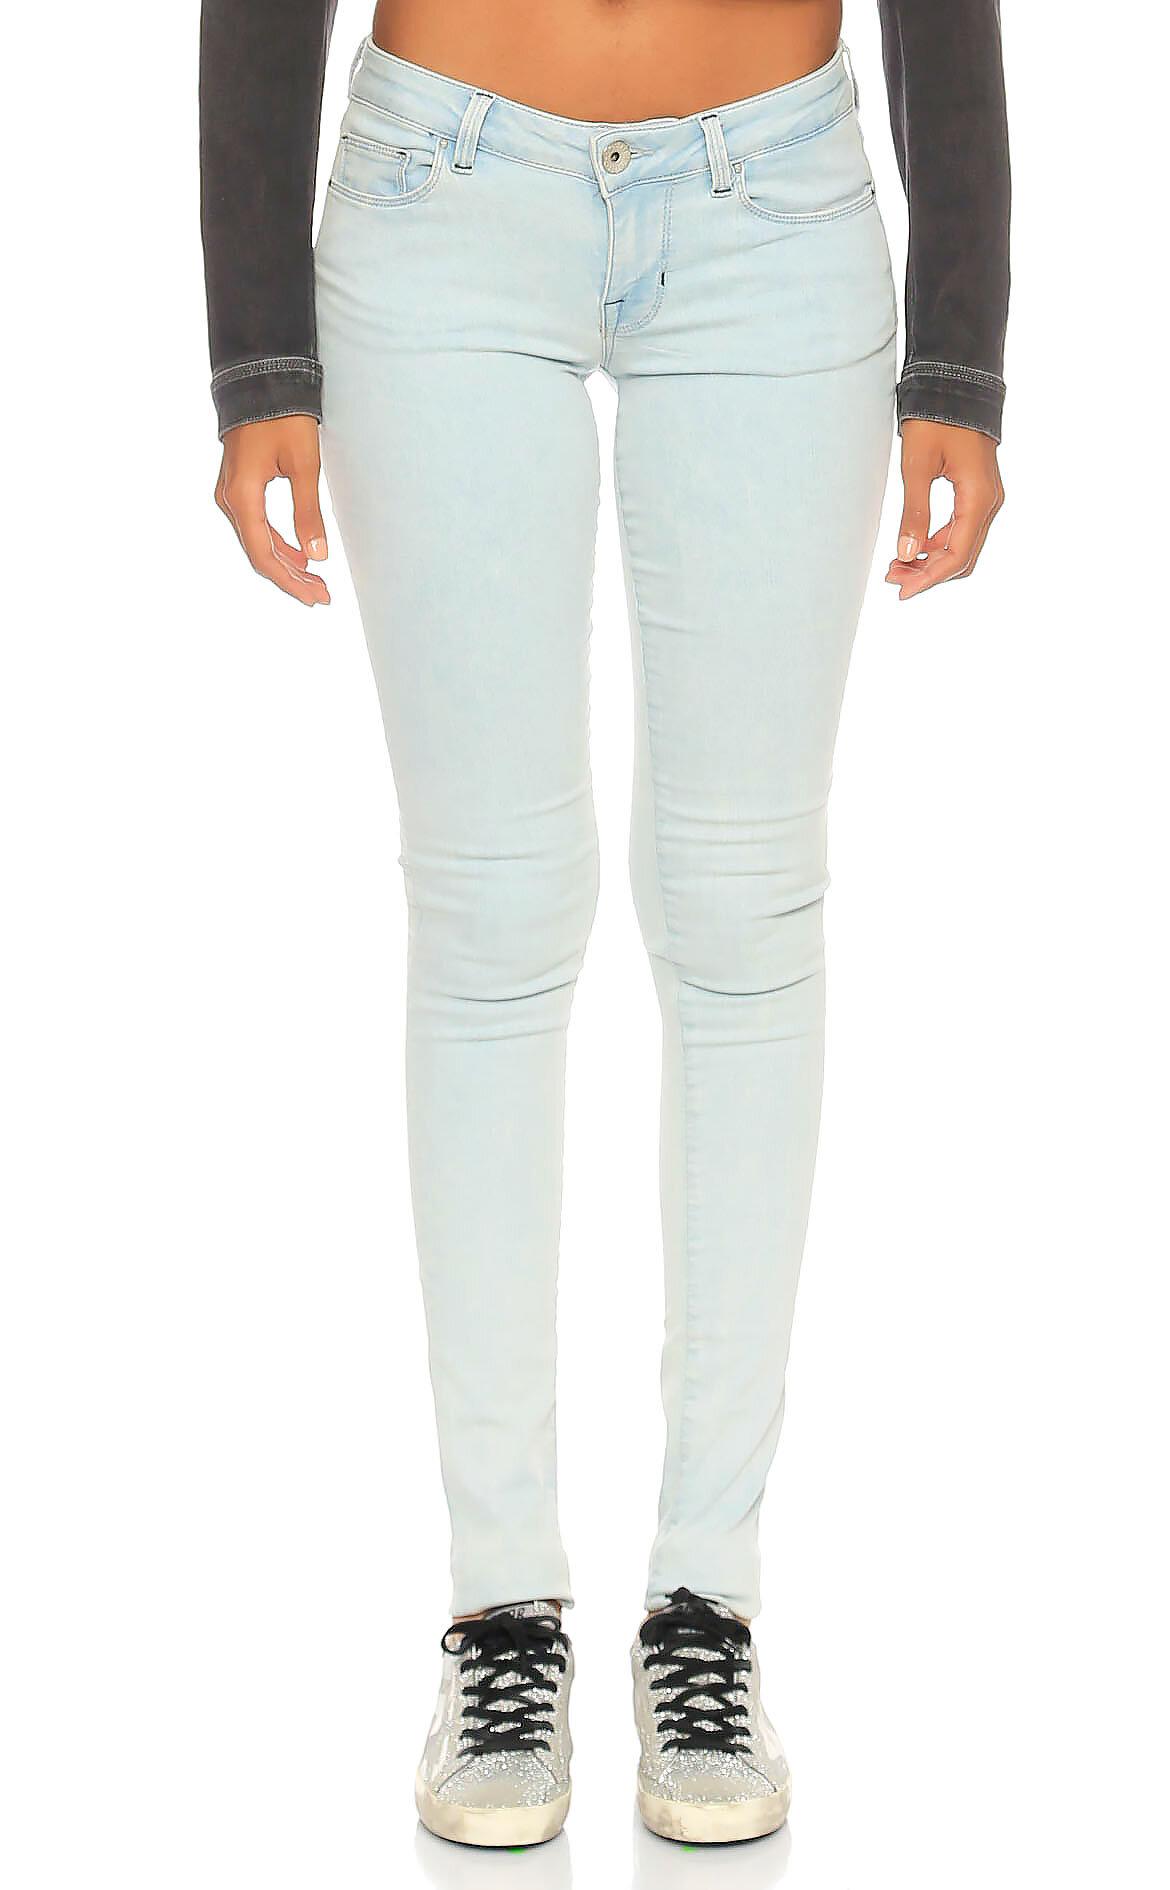 Guess-Guess Denim Skinny Jean Mavi Pantolon